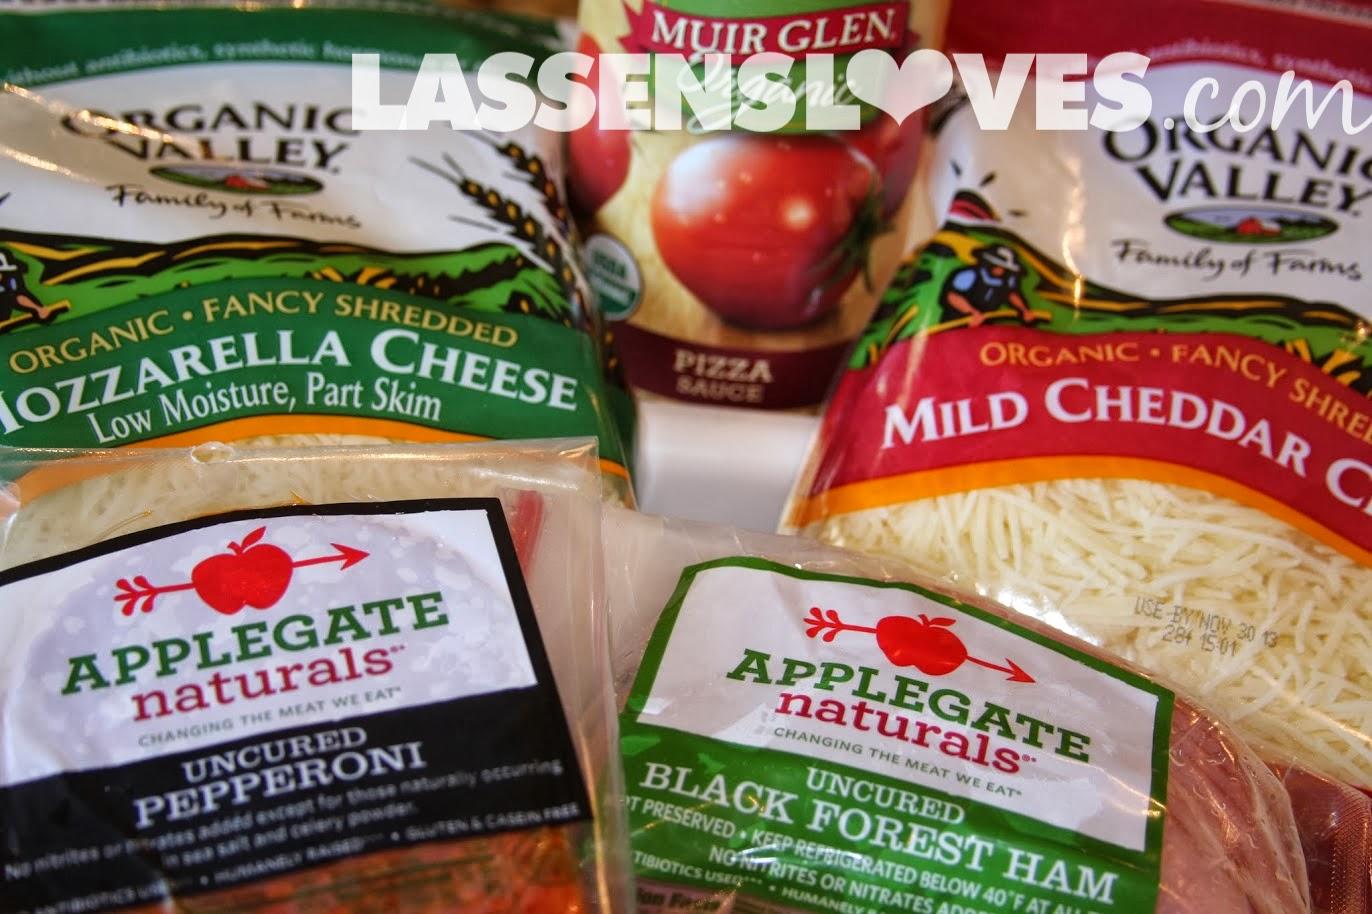 lassensloves.com, Lassen's, Lassens, healthy+lunches, lunch+ideas, lunch+rolls, lunch+pockets